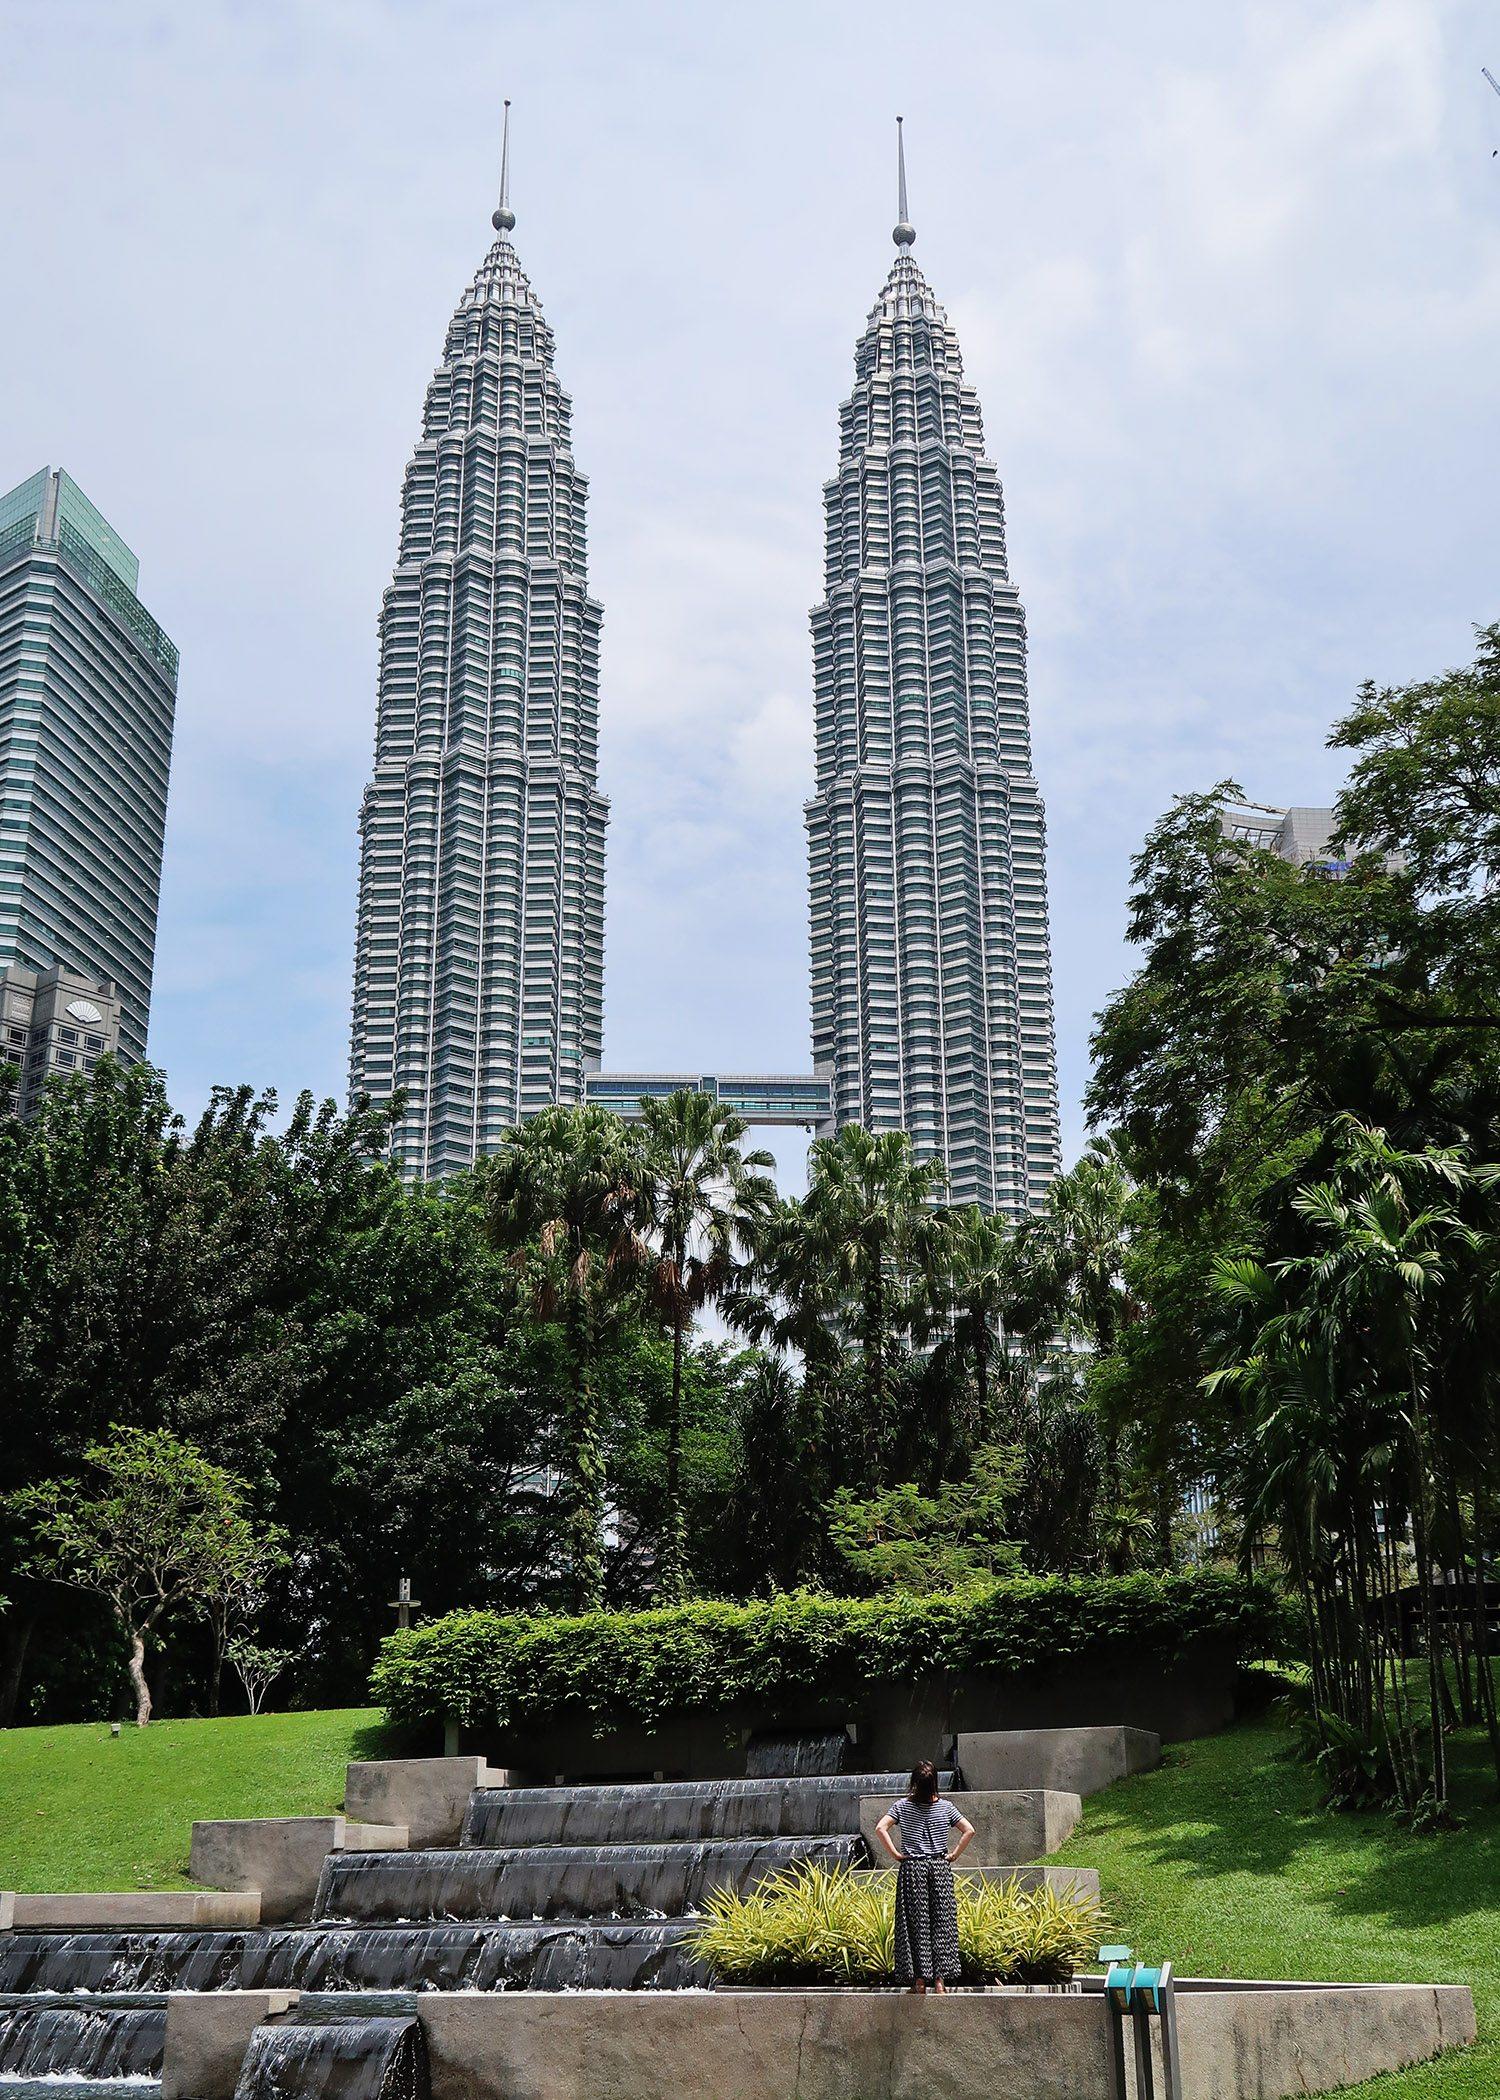 Visiting the Petronas Towers